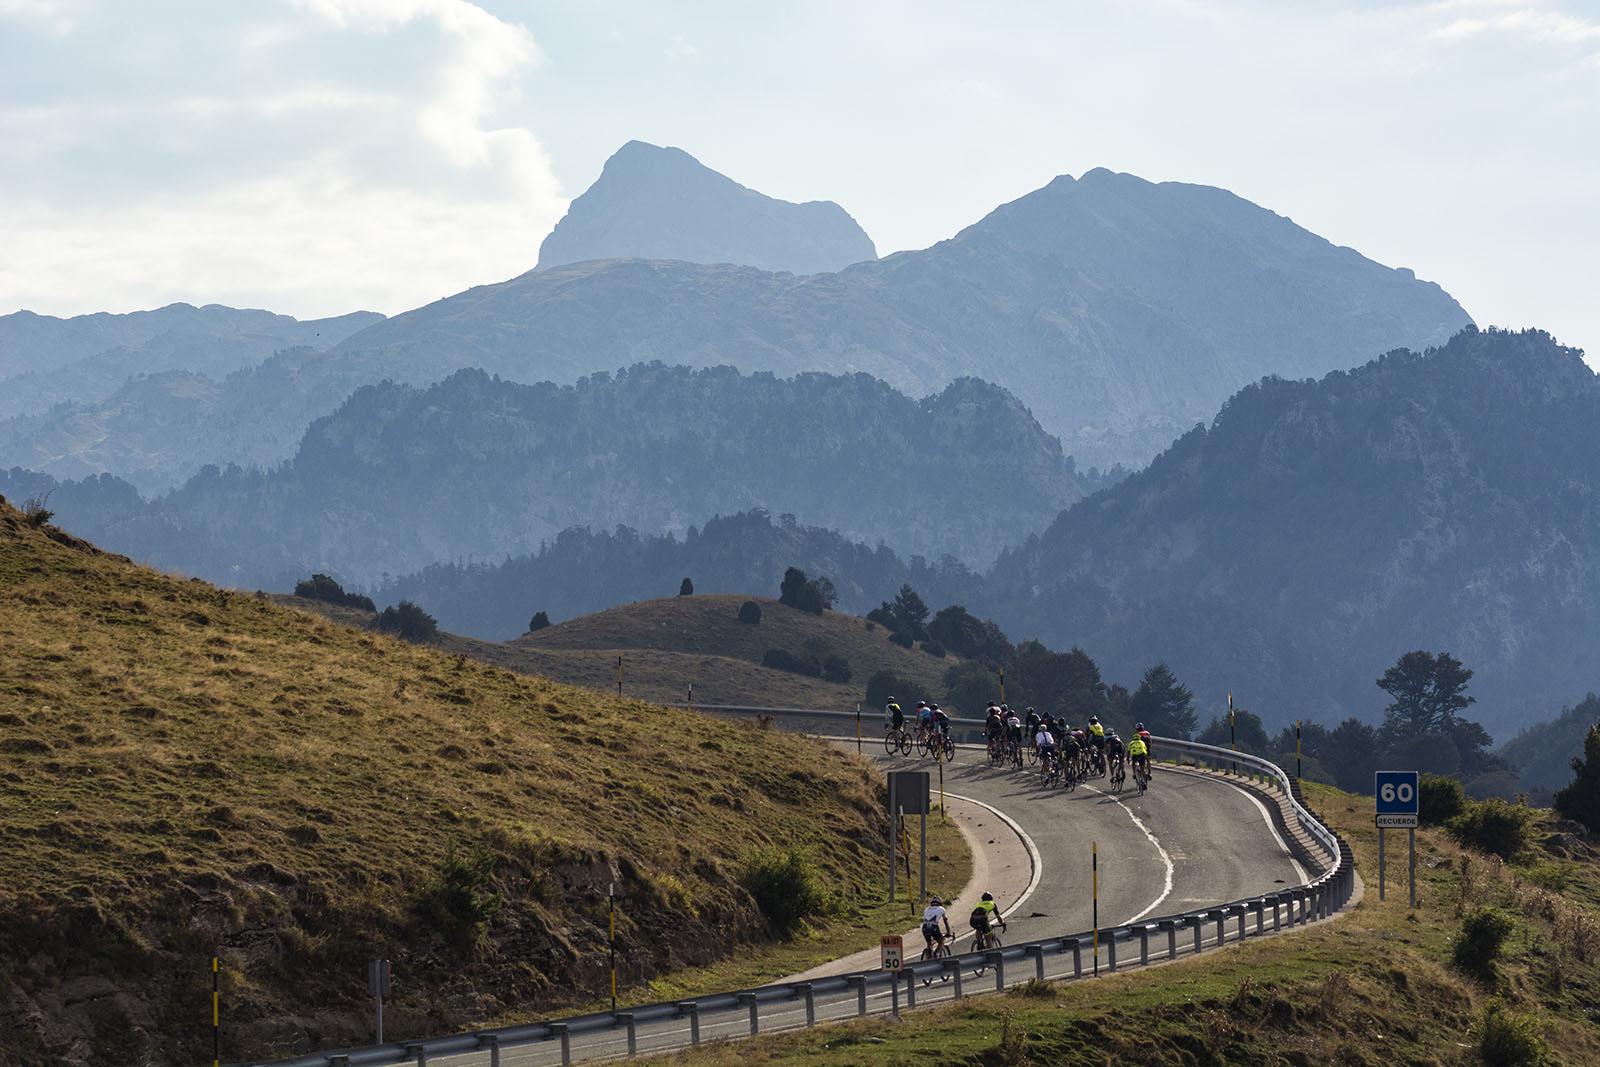 Larra-Larrau 2018 - Iñaki Larrea, Fotografía de naturaleza y montaña